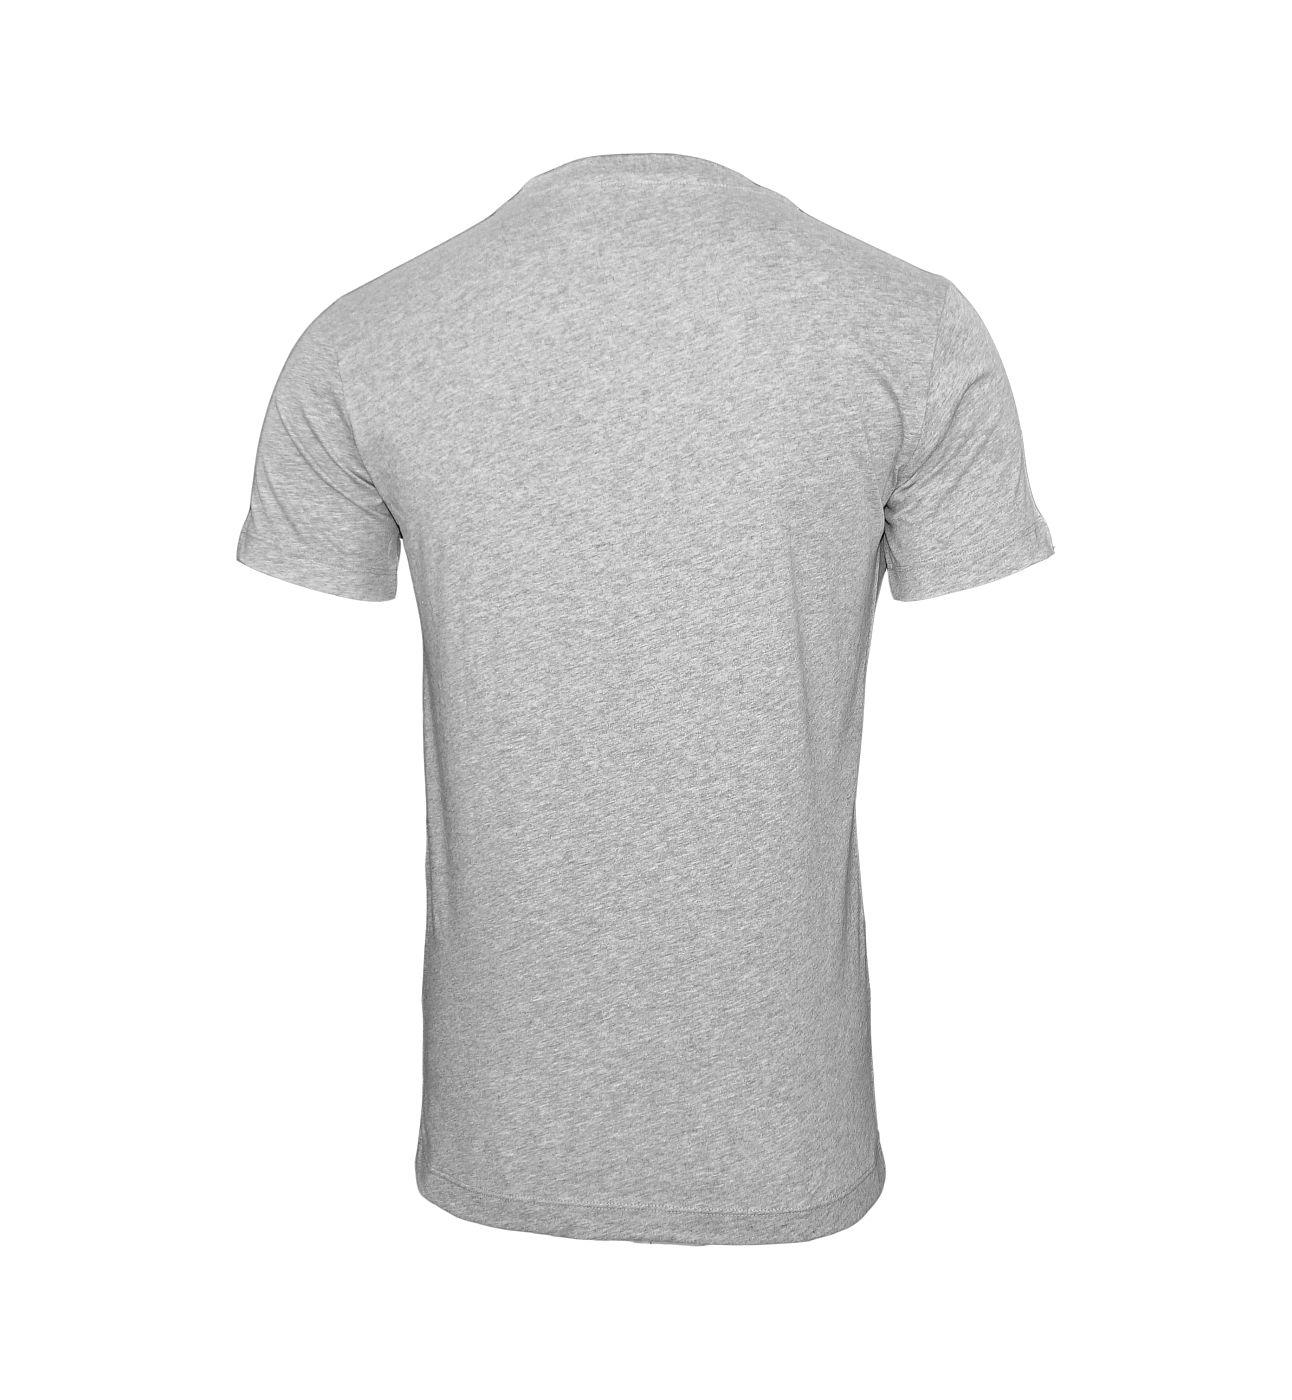 Replay 2er Pack T-Shirts V-Ausschnitt M3589 22602 060 GREY MELANGE, BLACK S18-RPT1